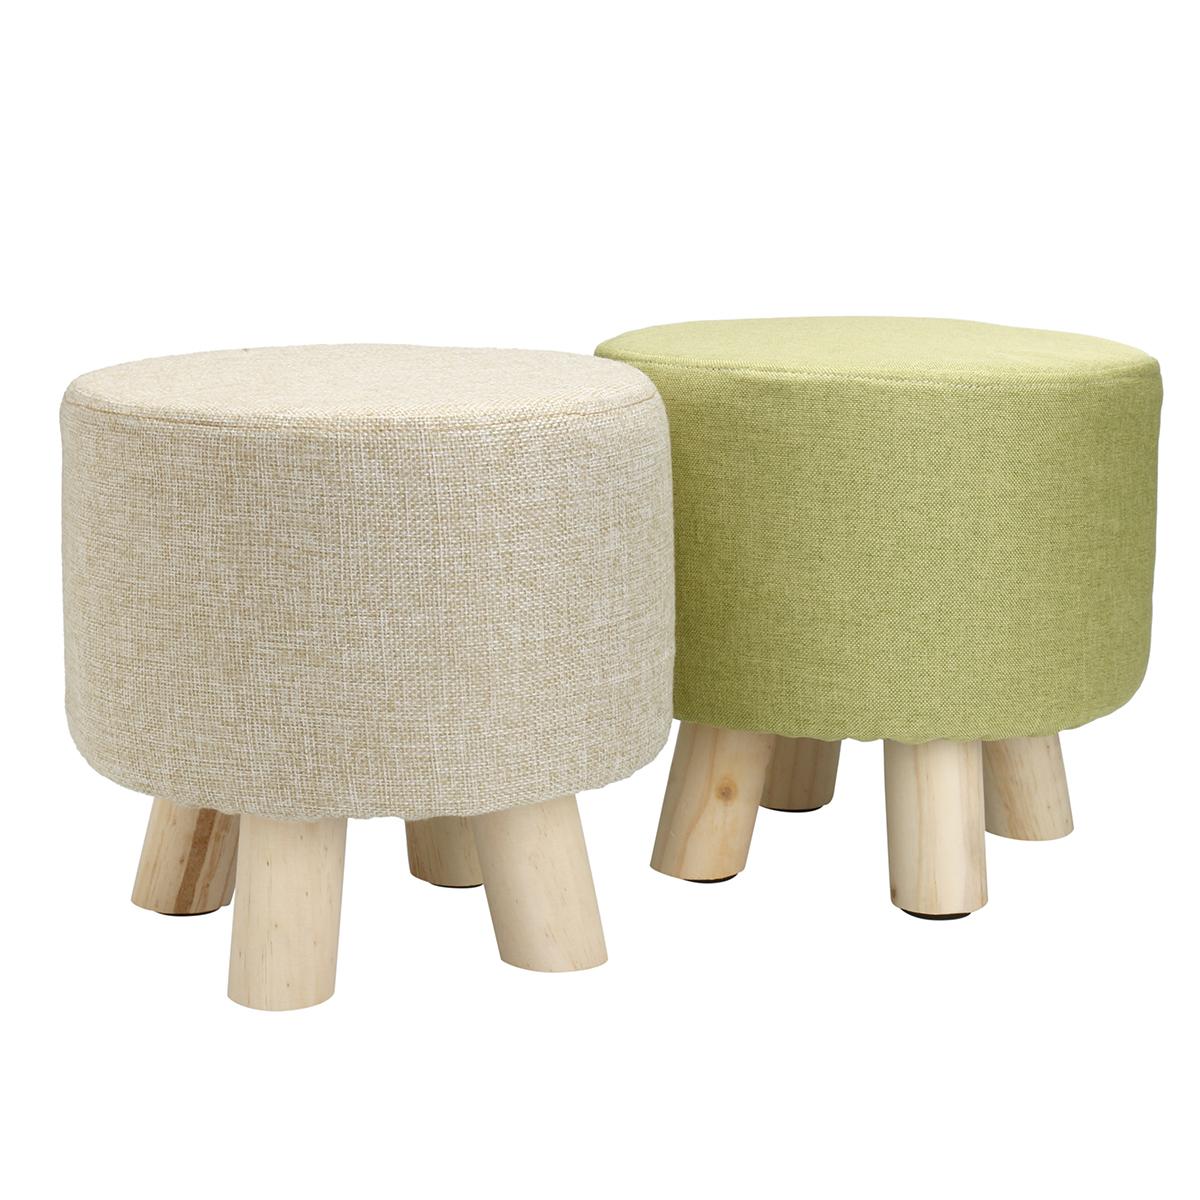 Swell Living Room Pouffe Chairs Sofa Ottoman Foot Stool Bedroom Hallway Chair Lamtechconsult Wood Chair Design Ideas Lamtechconsultcom